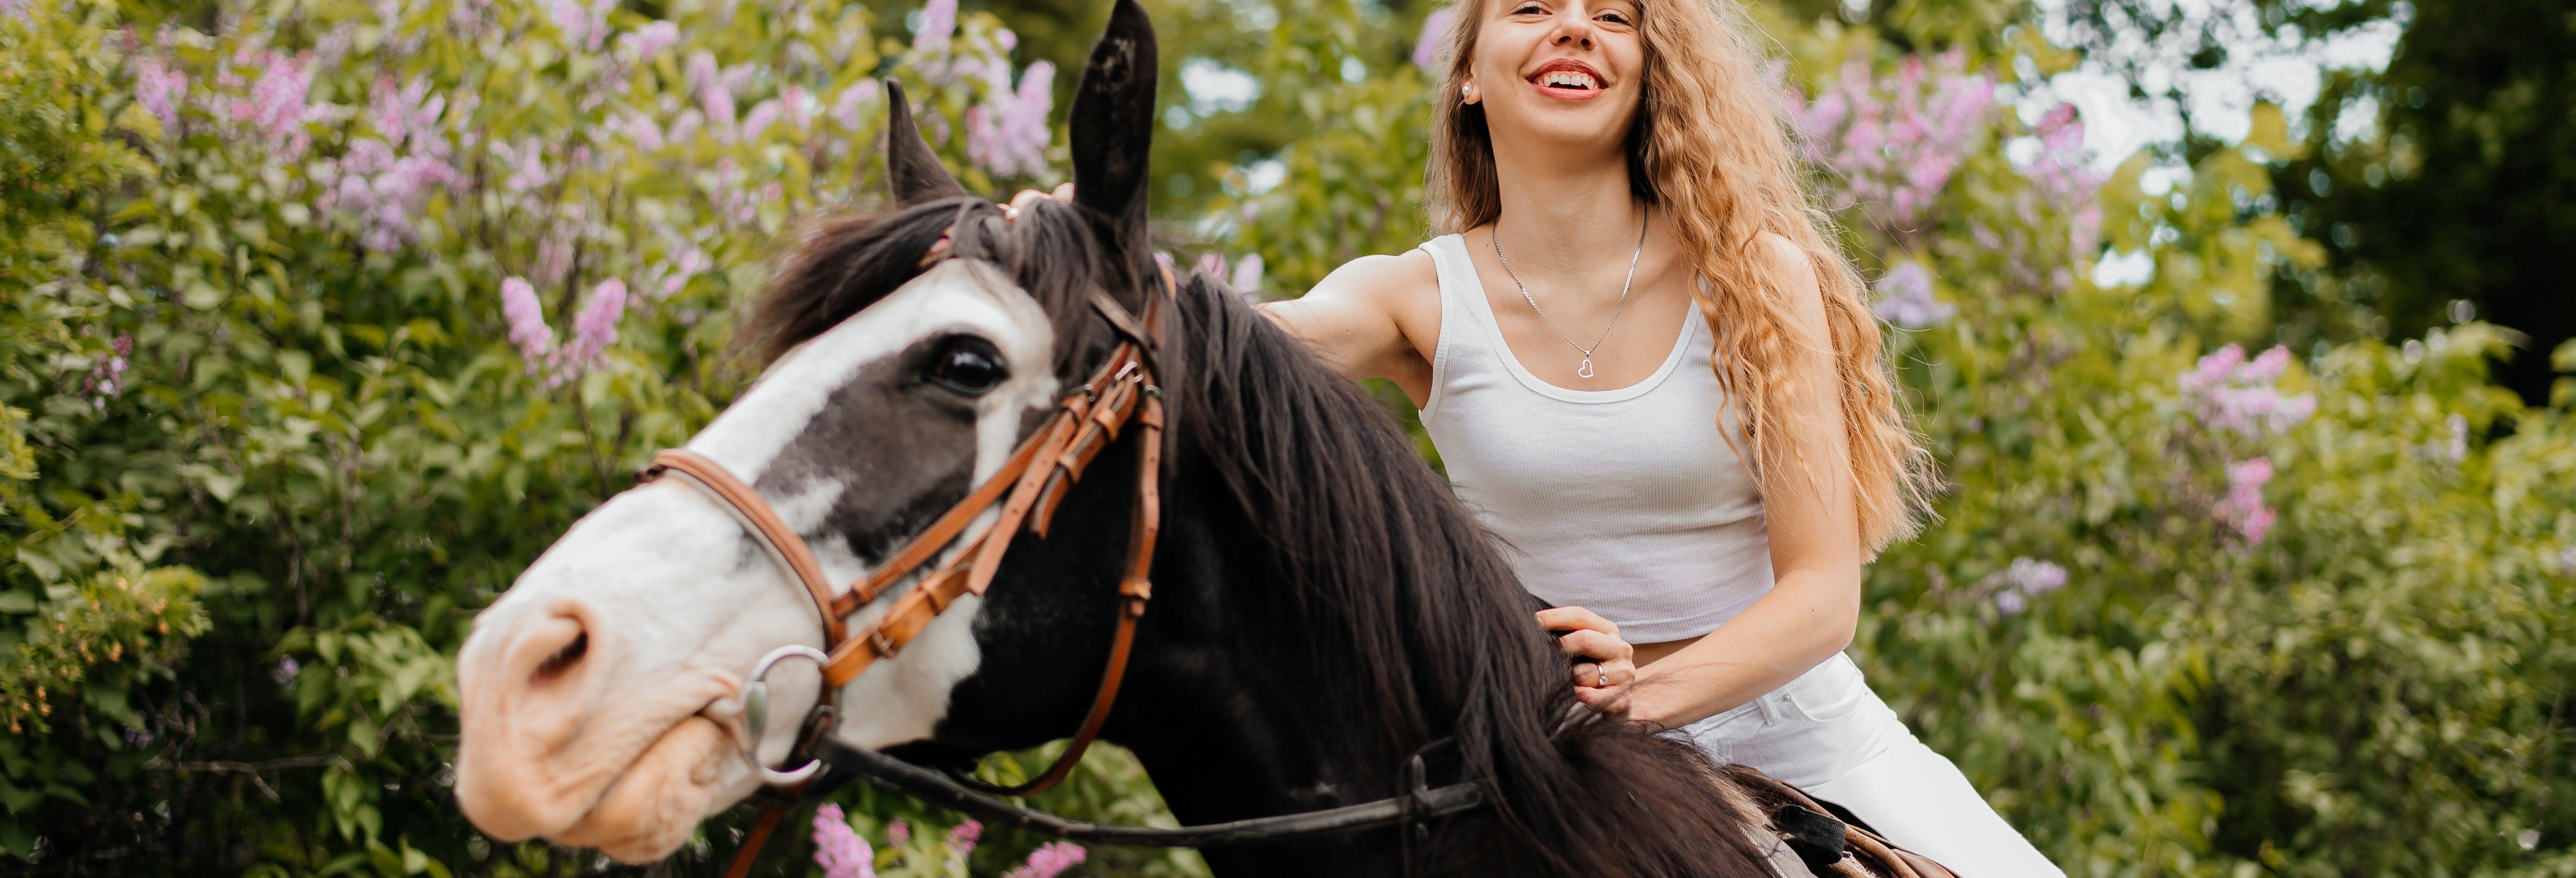 Excursão a Montserrat + Passeio a cavalo